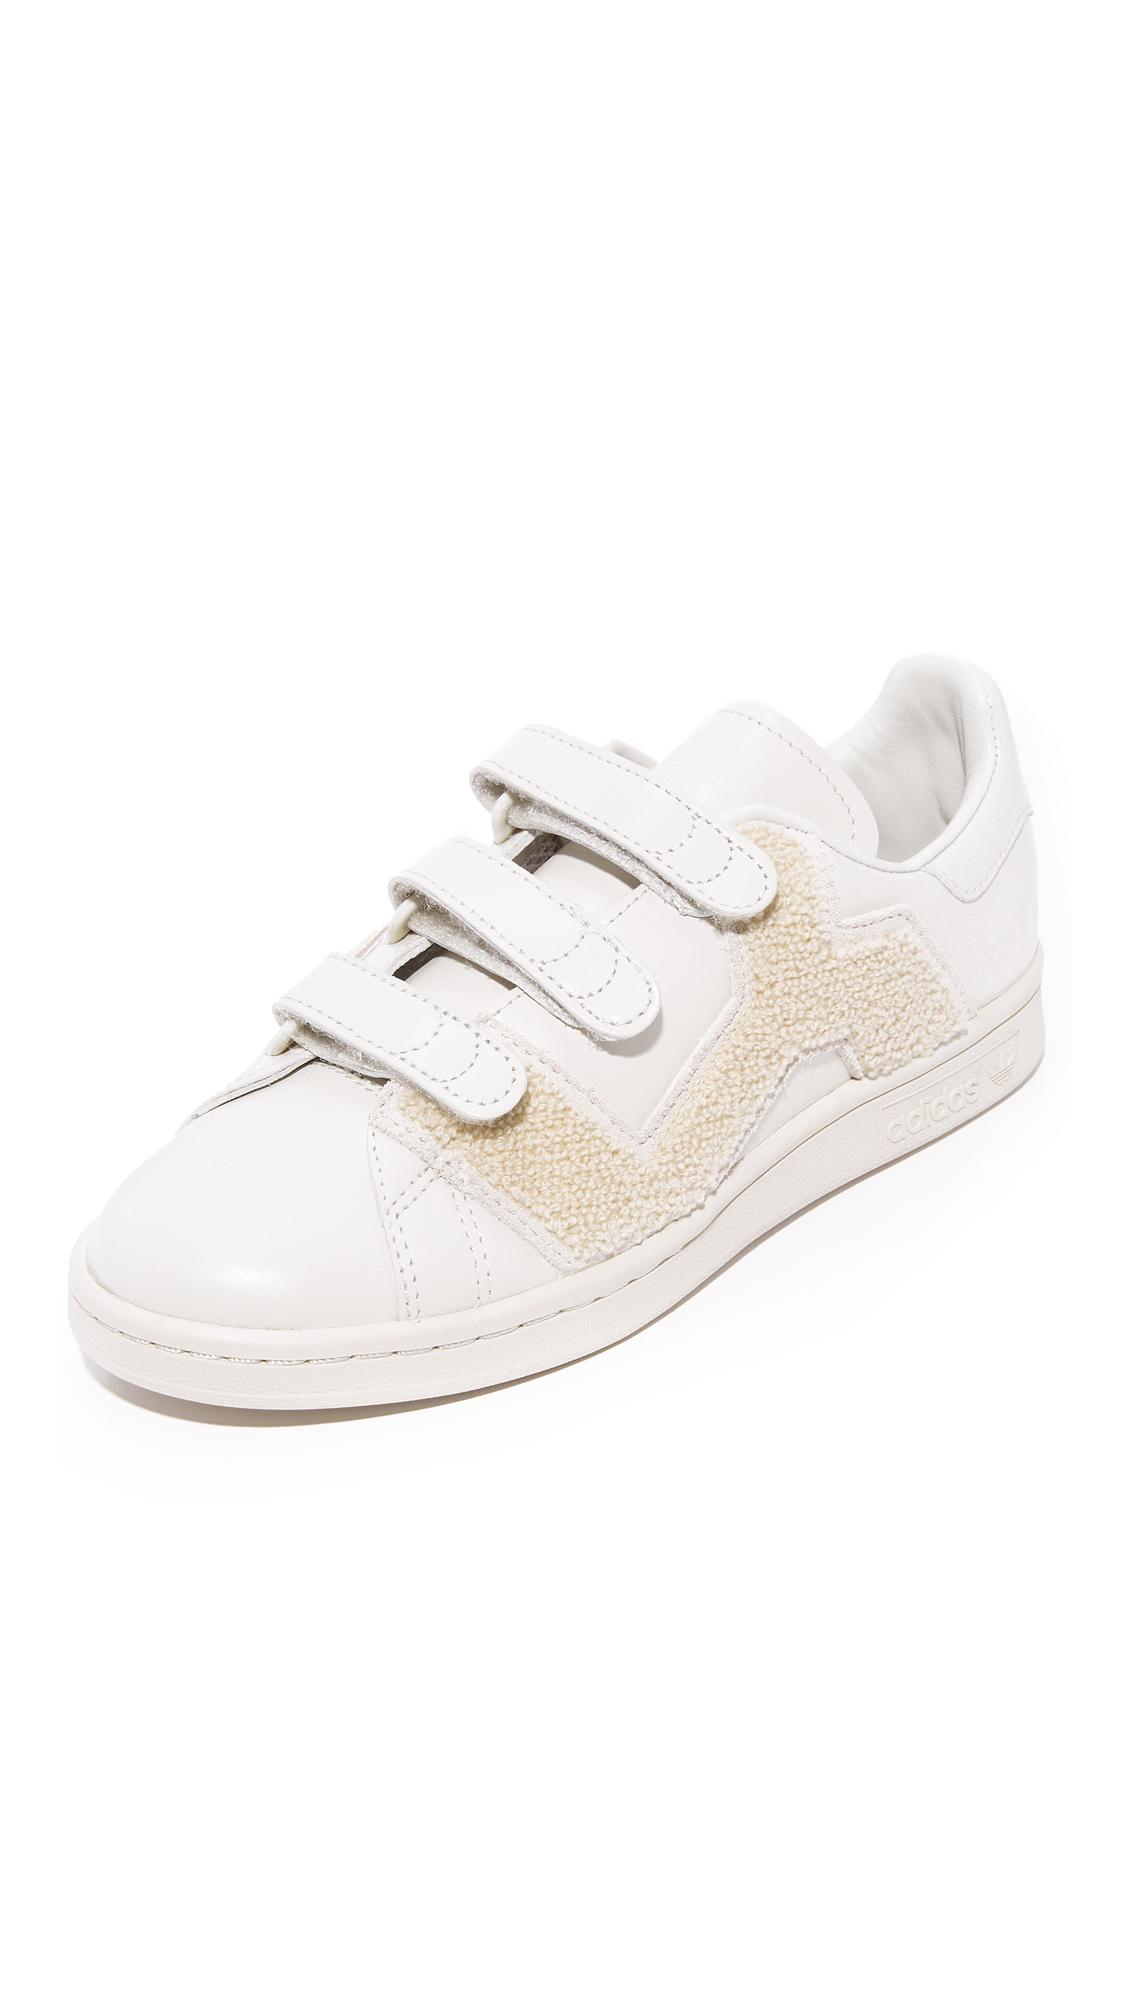 Adidas Raf Simons Stan Smith Comfort Badge Sneakers - Talc/Talc/Talc